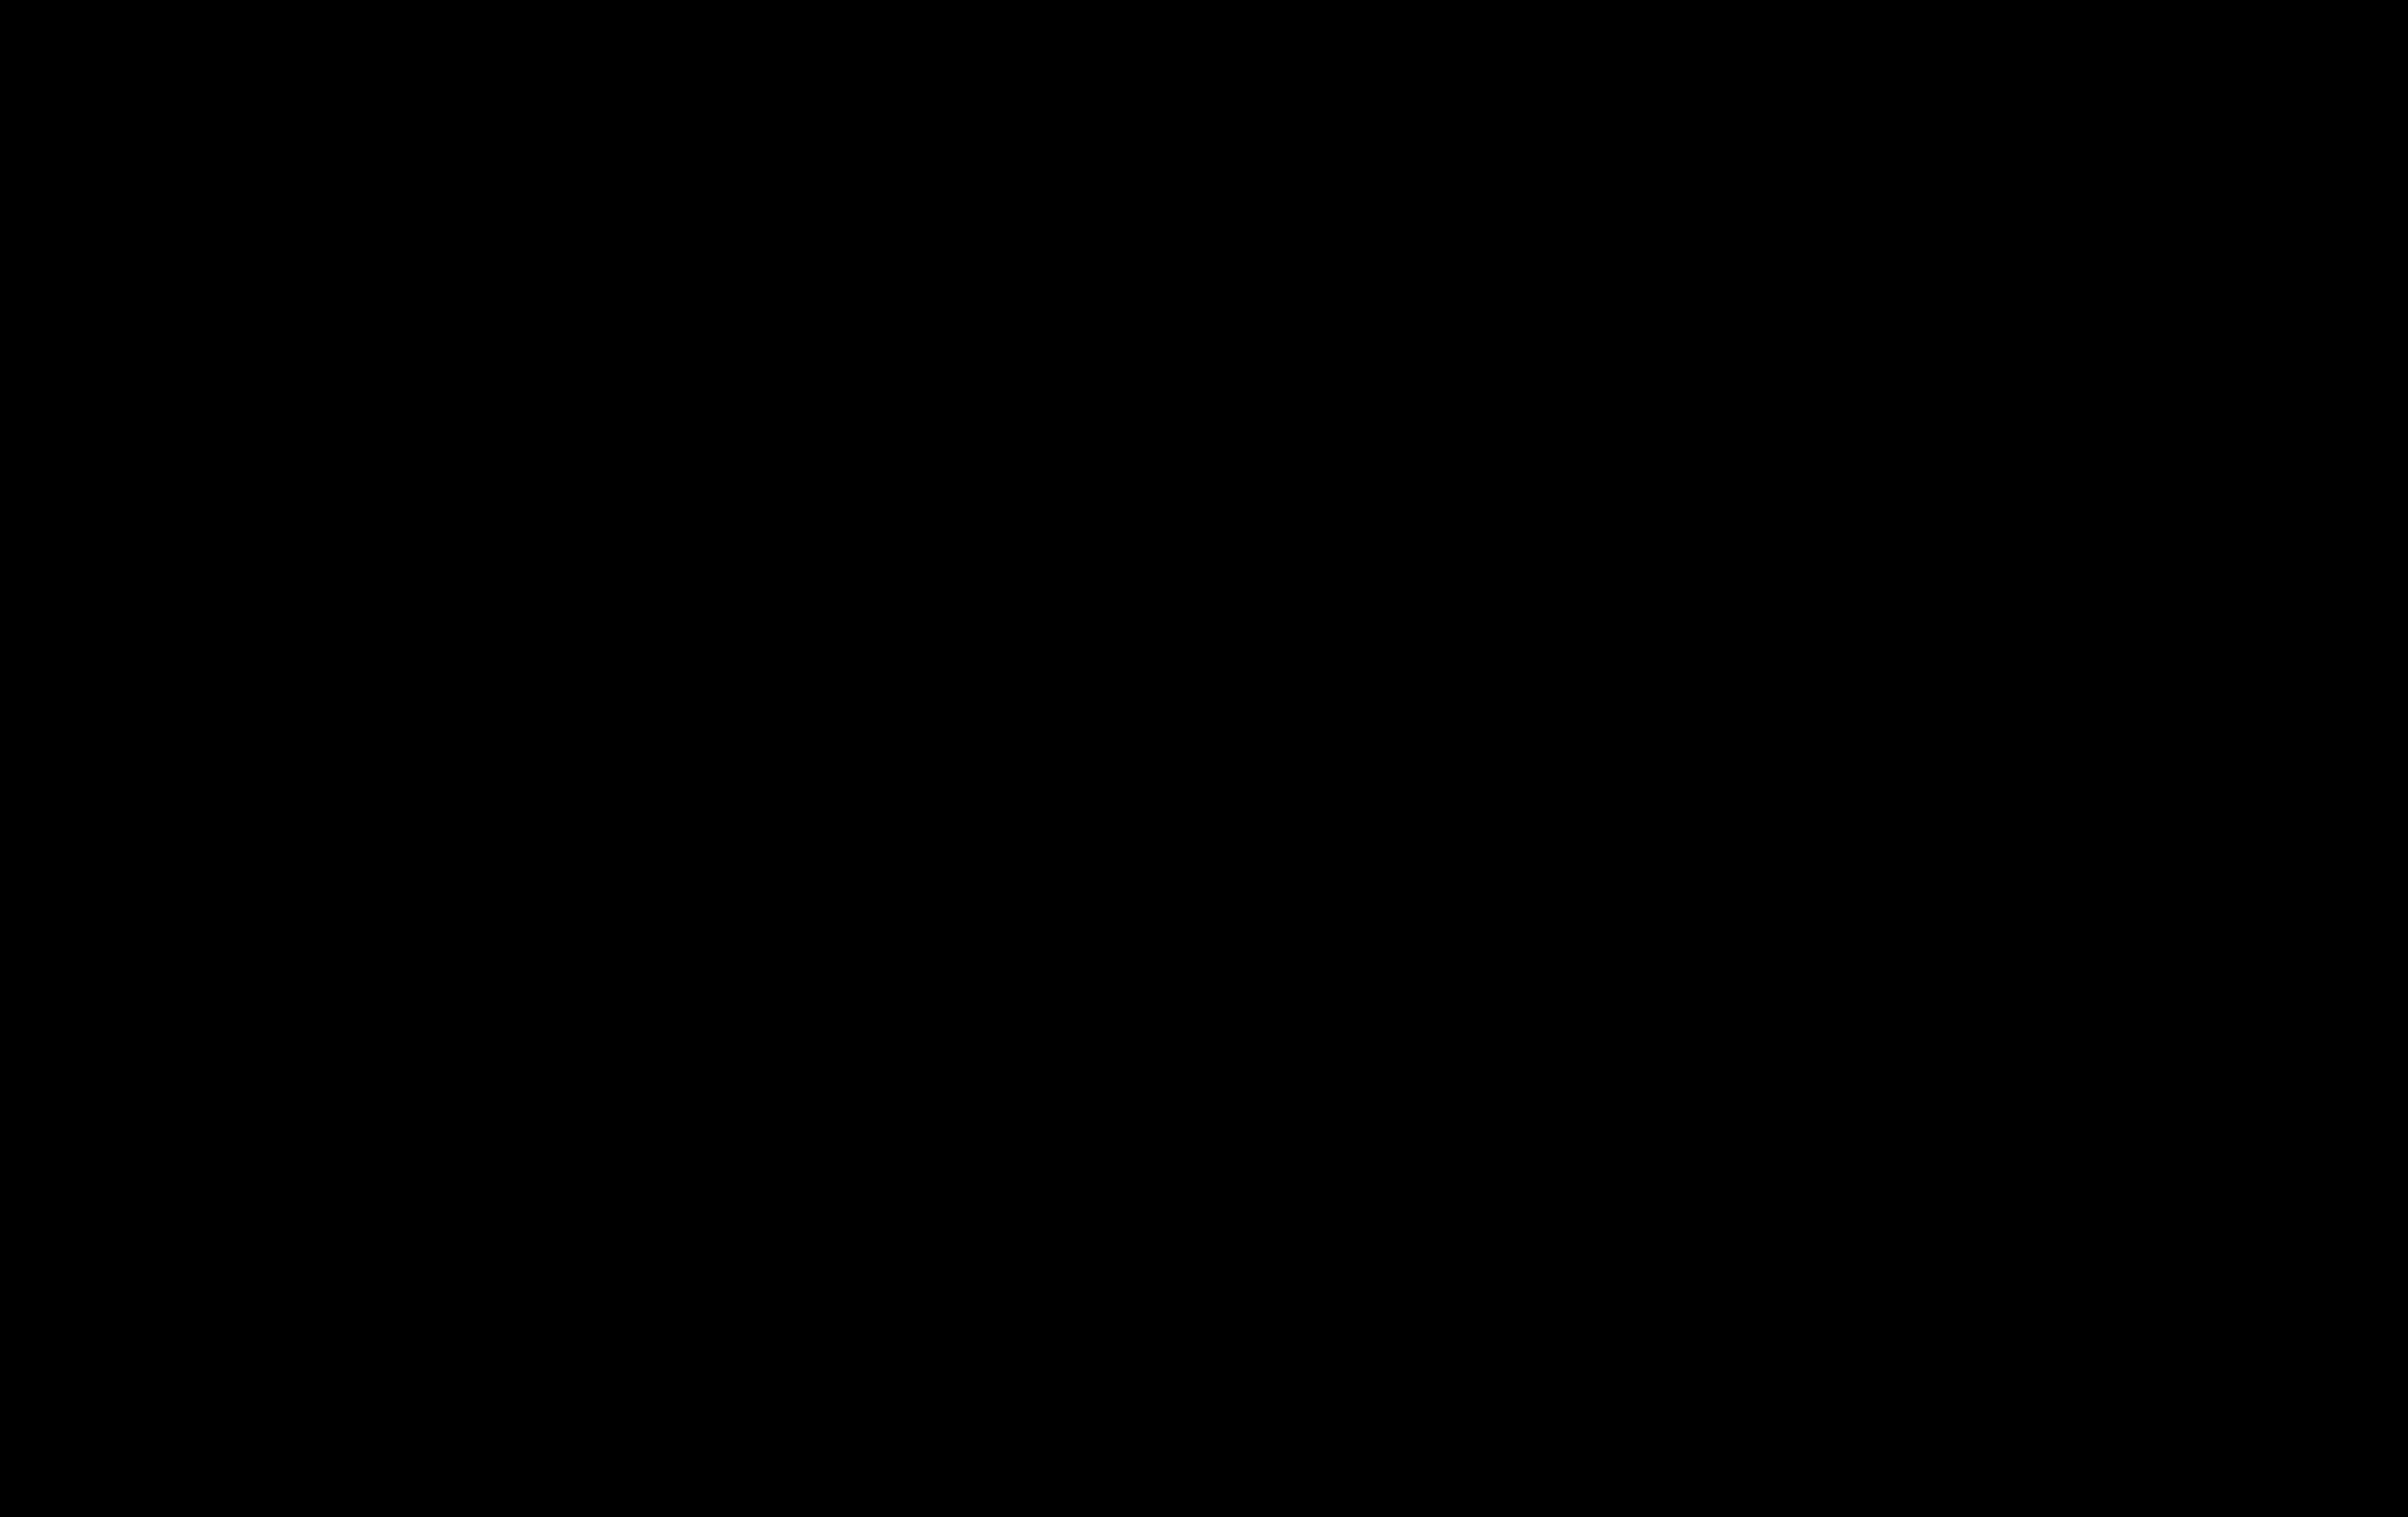 Silhouette de Gabillou